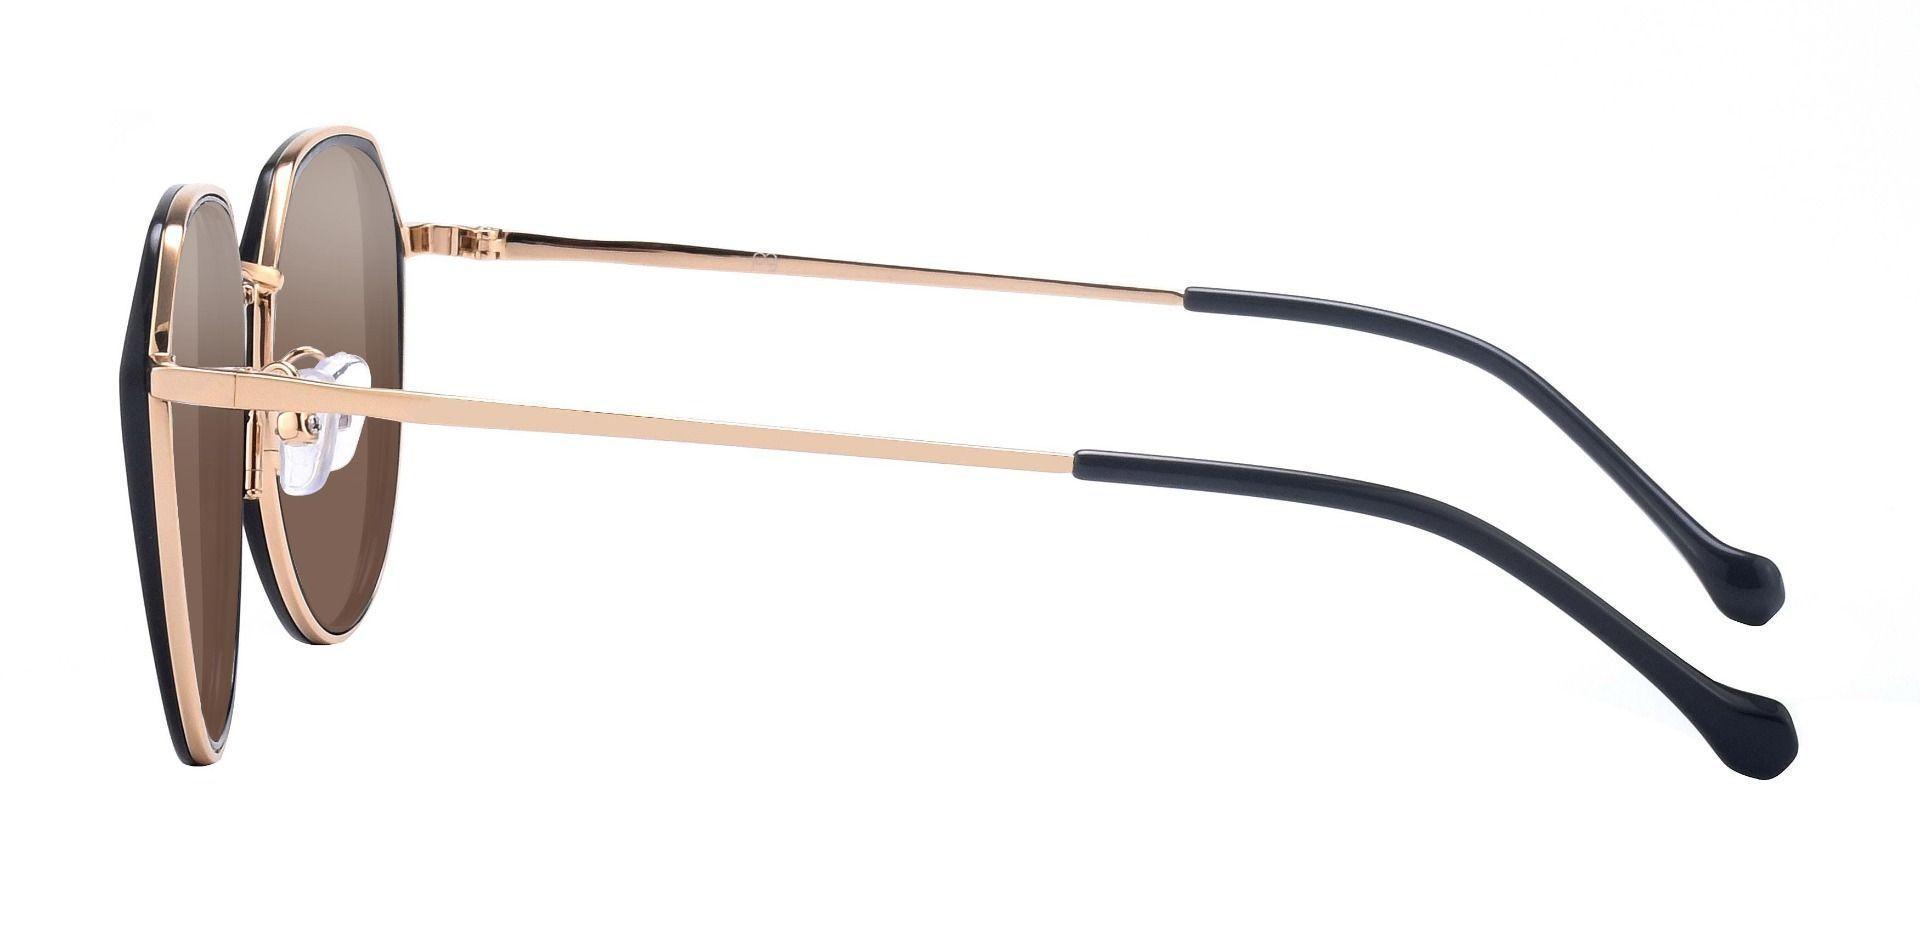 Yorke Geometric Prescription Sunglasses - Black Frame With Brown Lenses